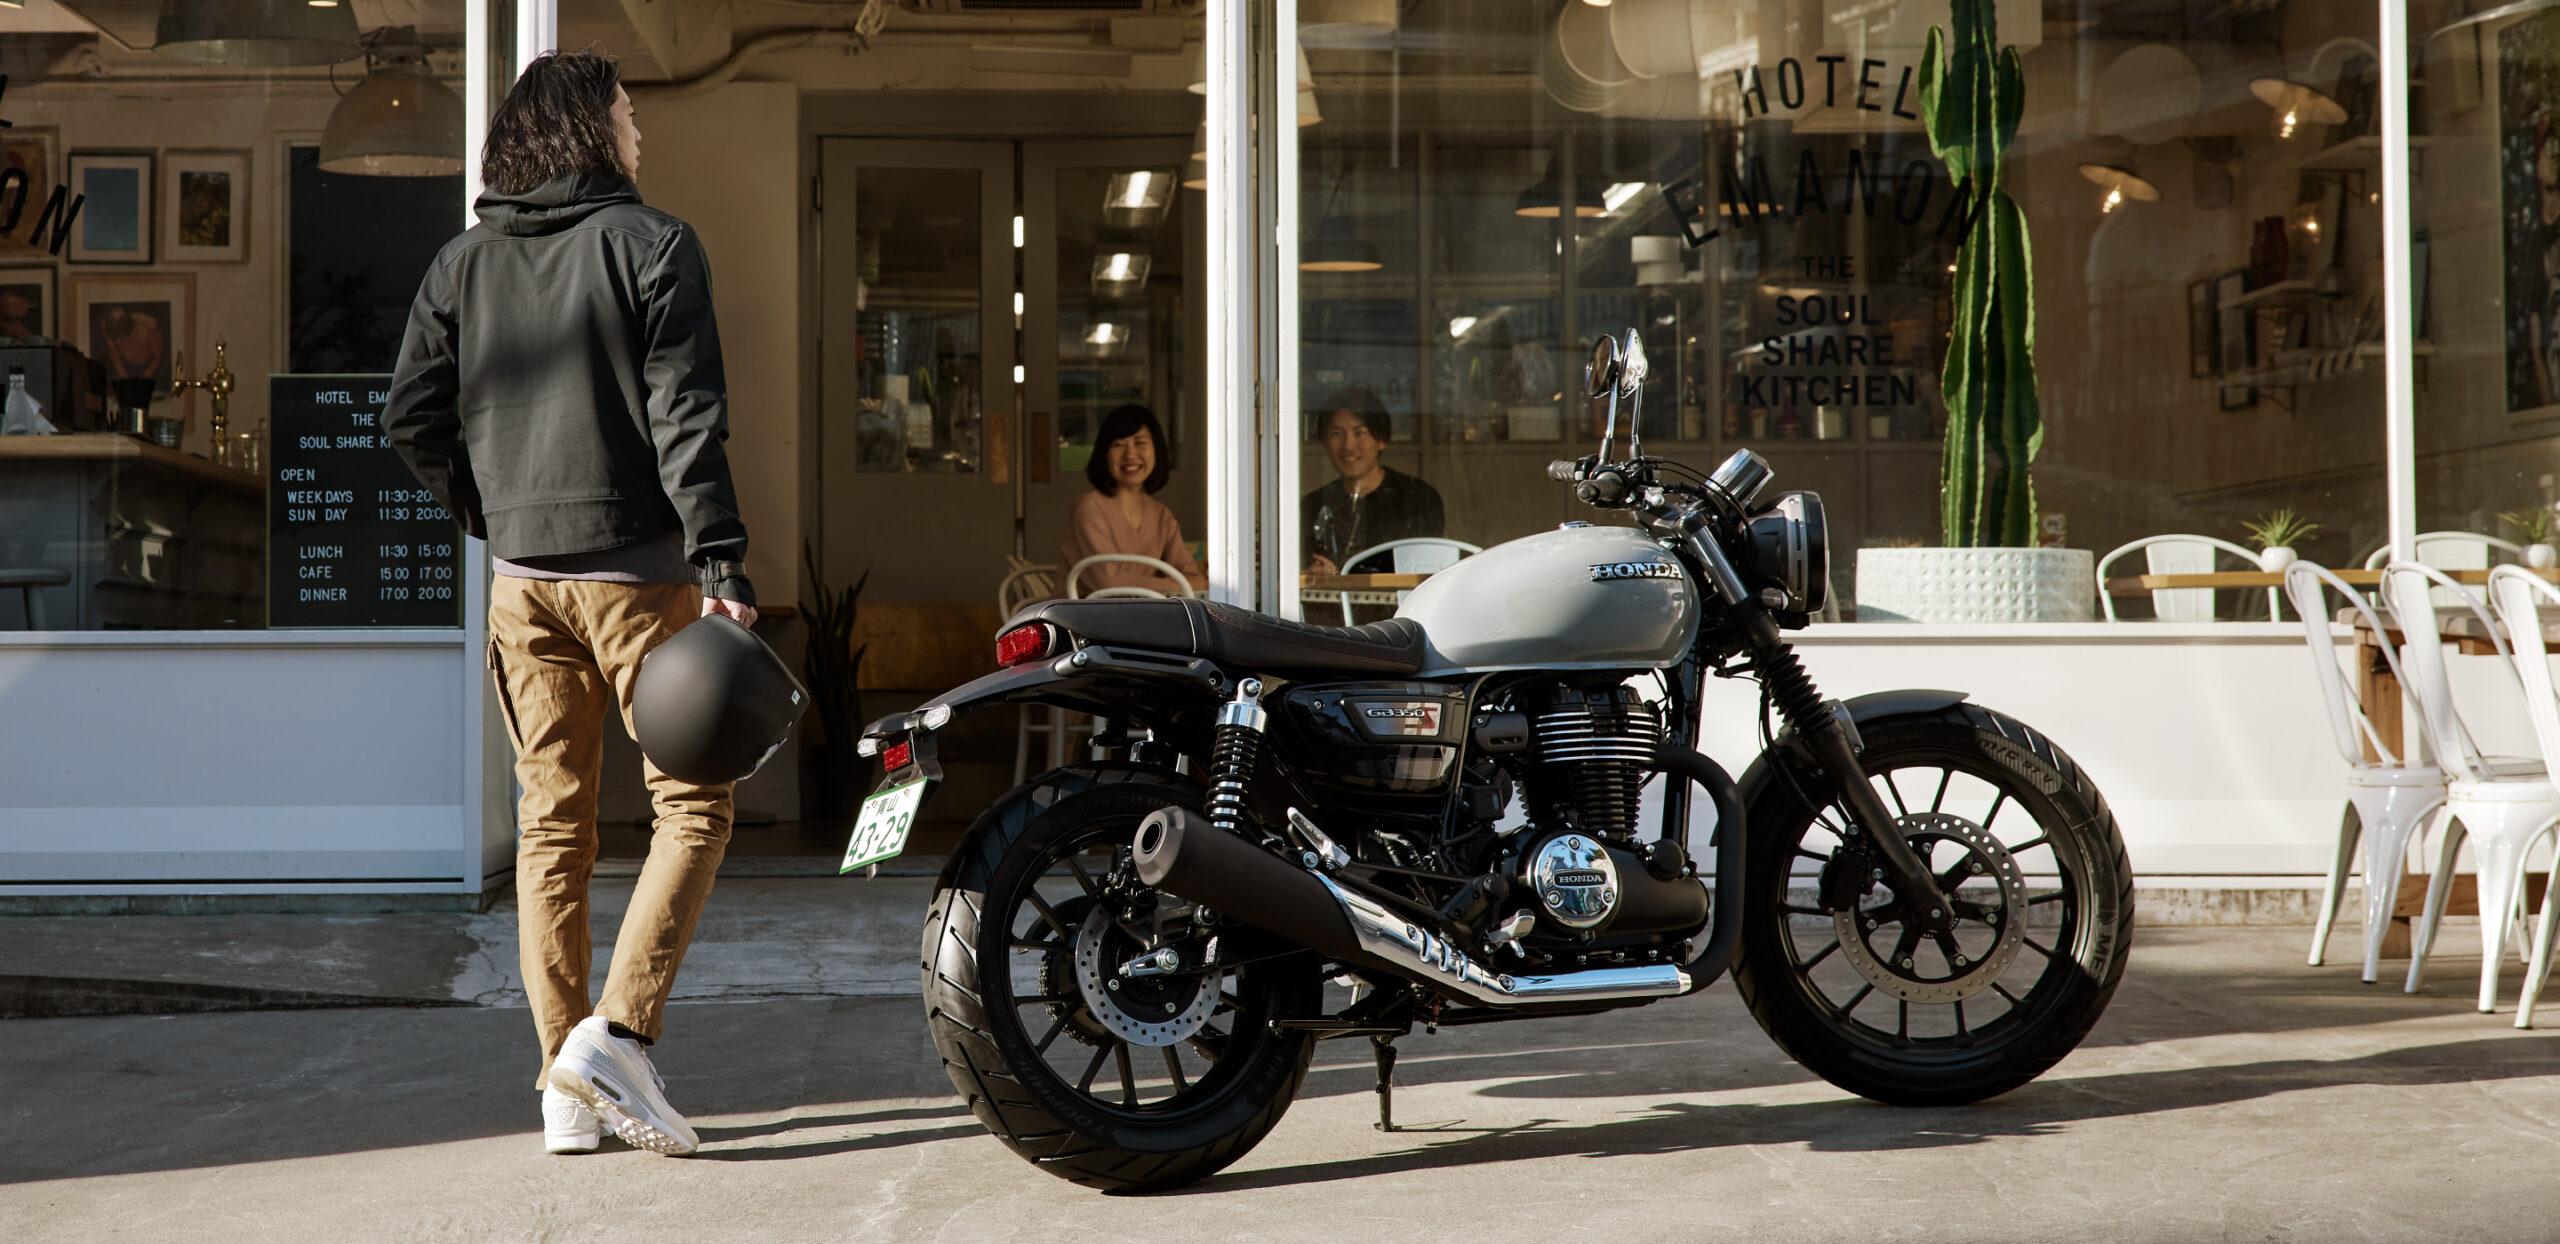 【GB350】ホンダから待望の空冷単気筒バイク